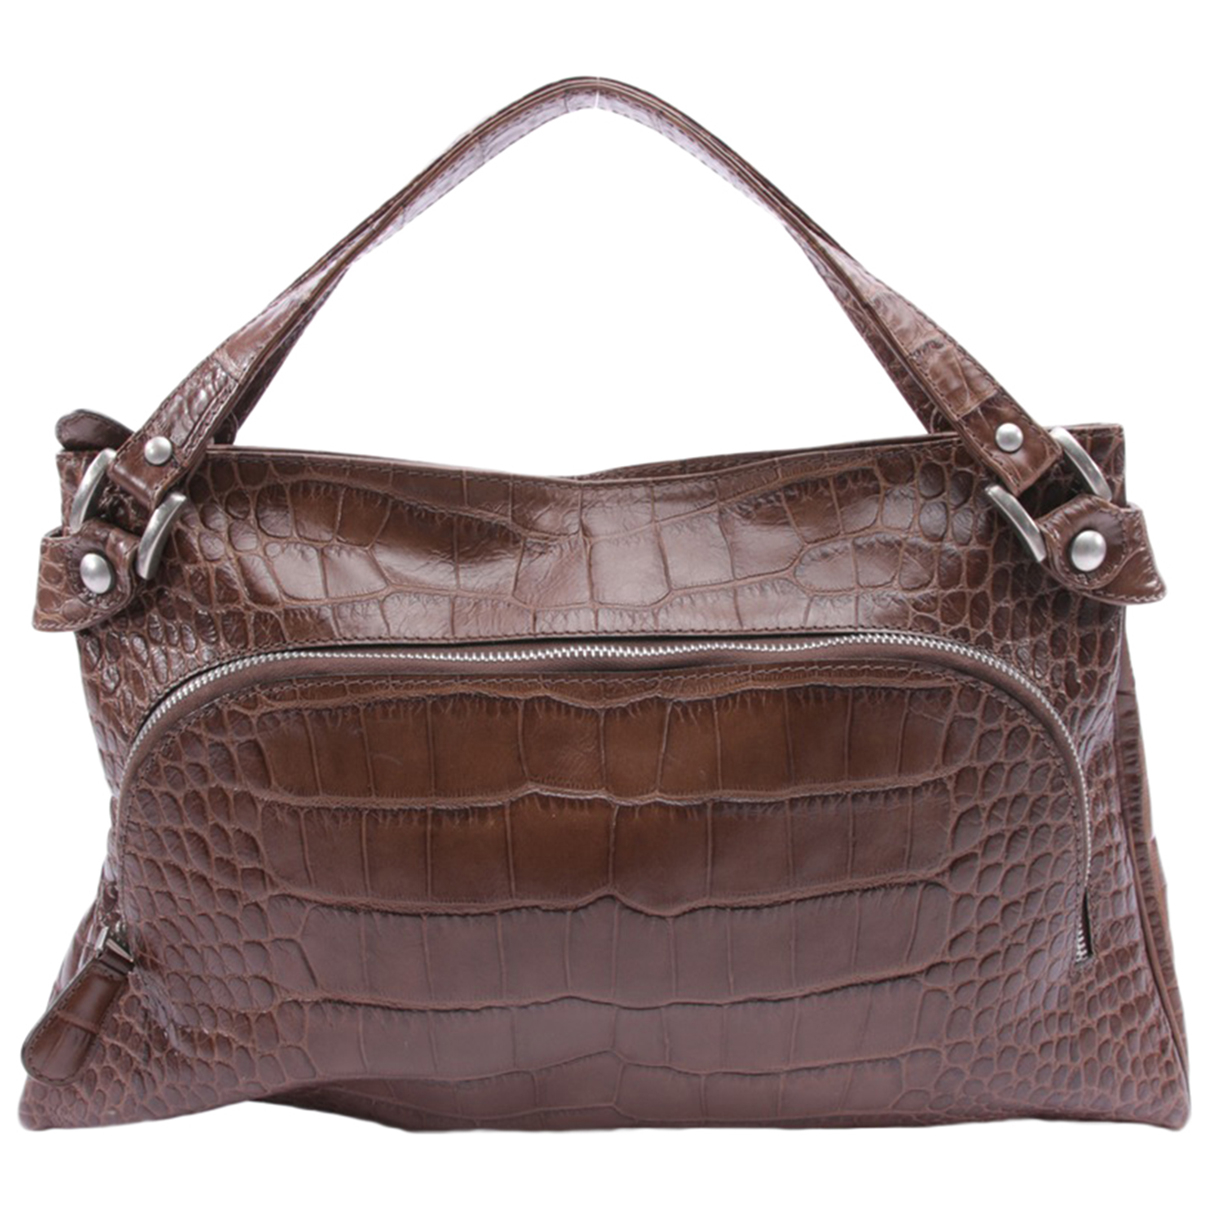 Marni \N Brown Leather handbag for Women \N